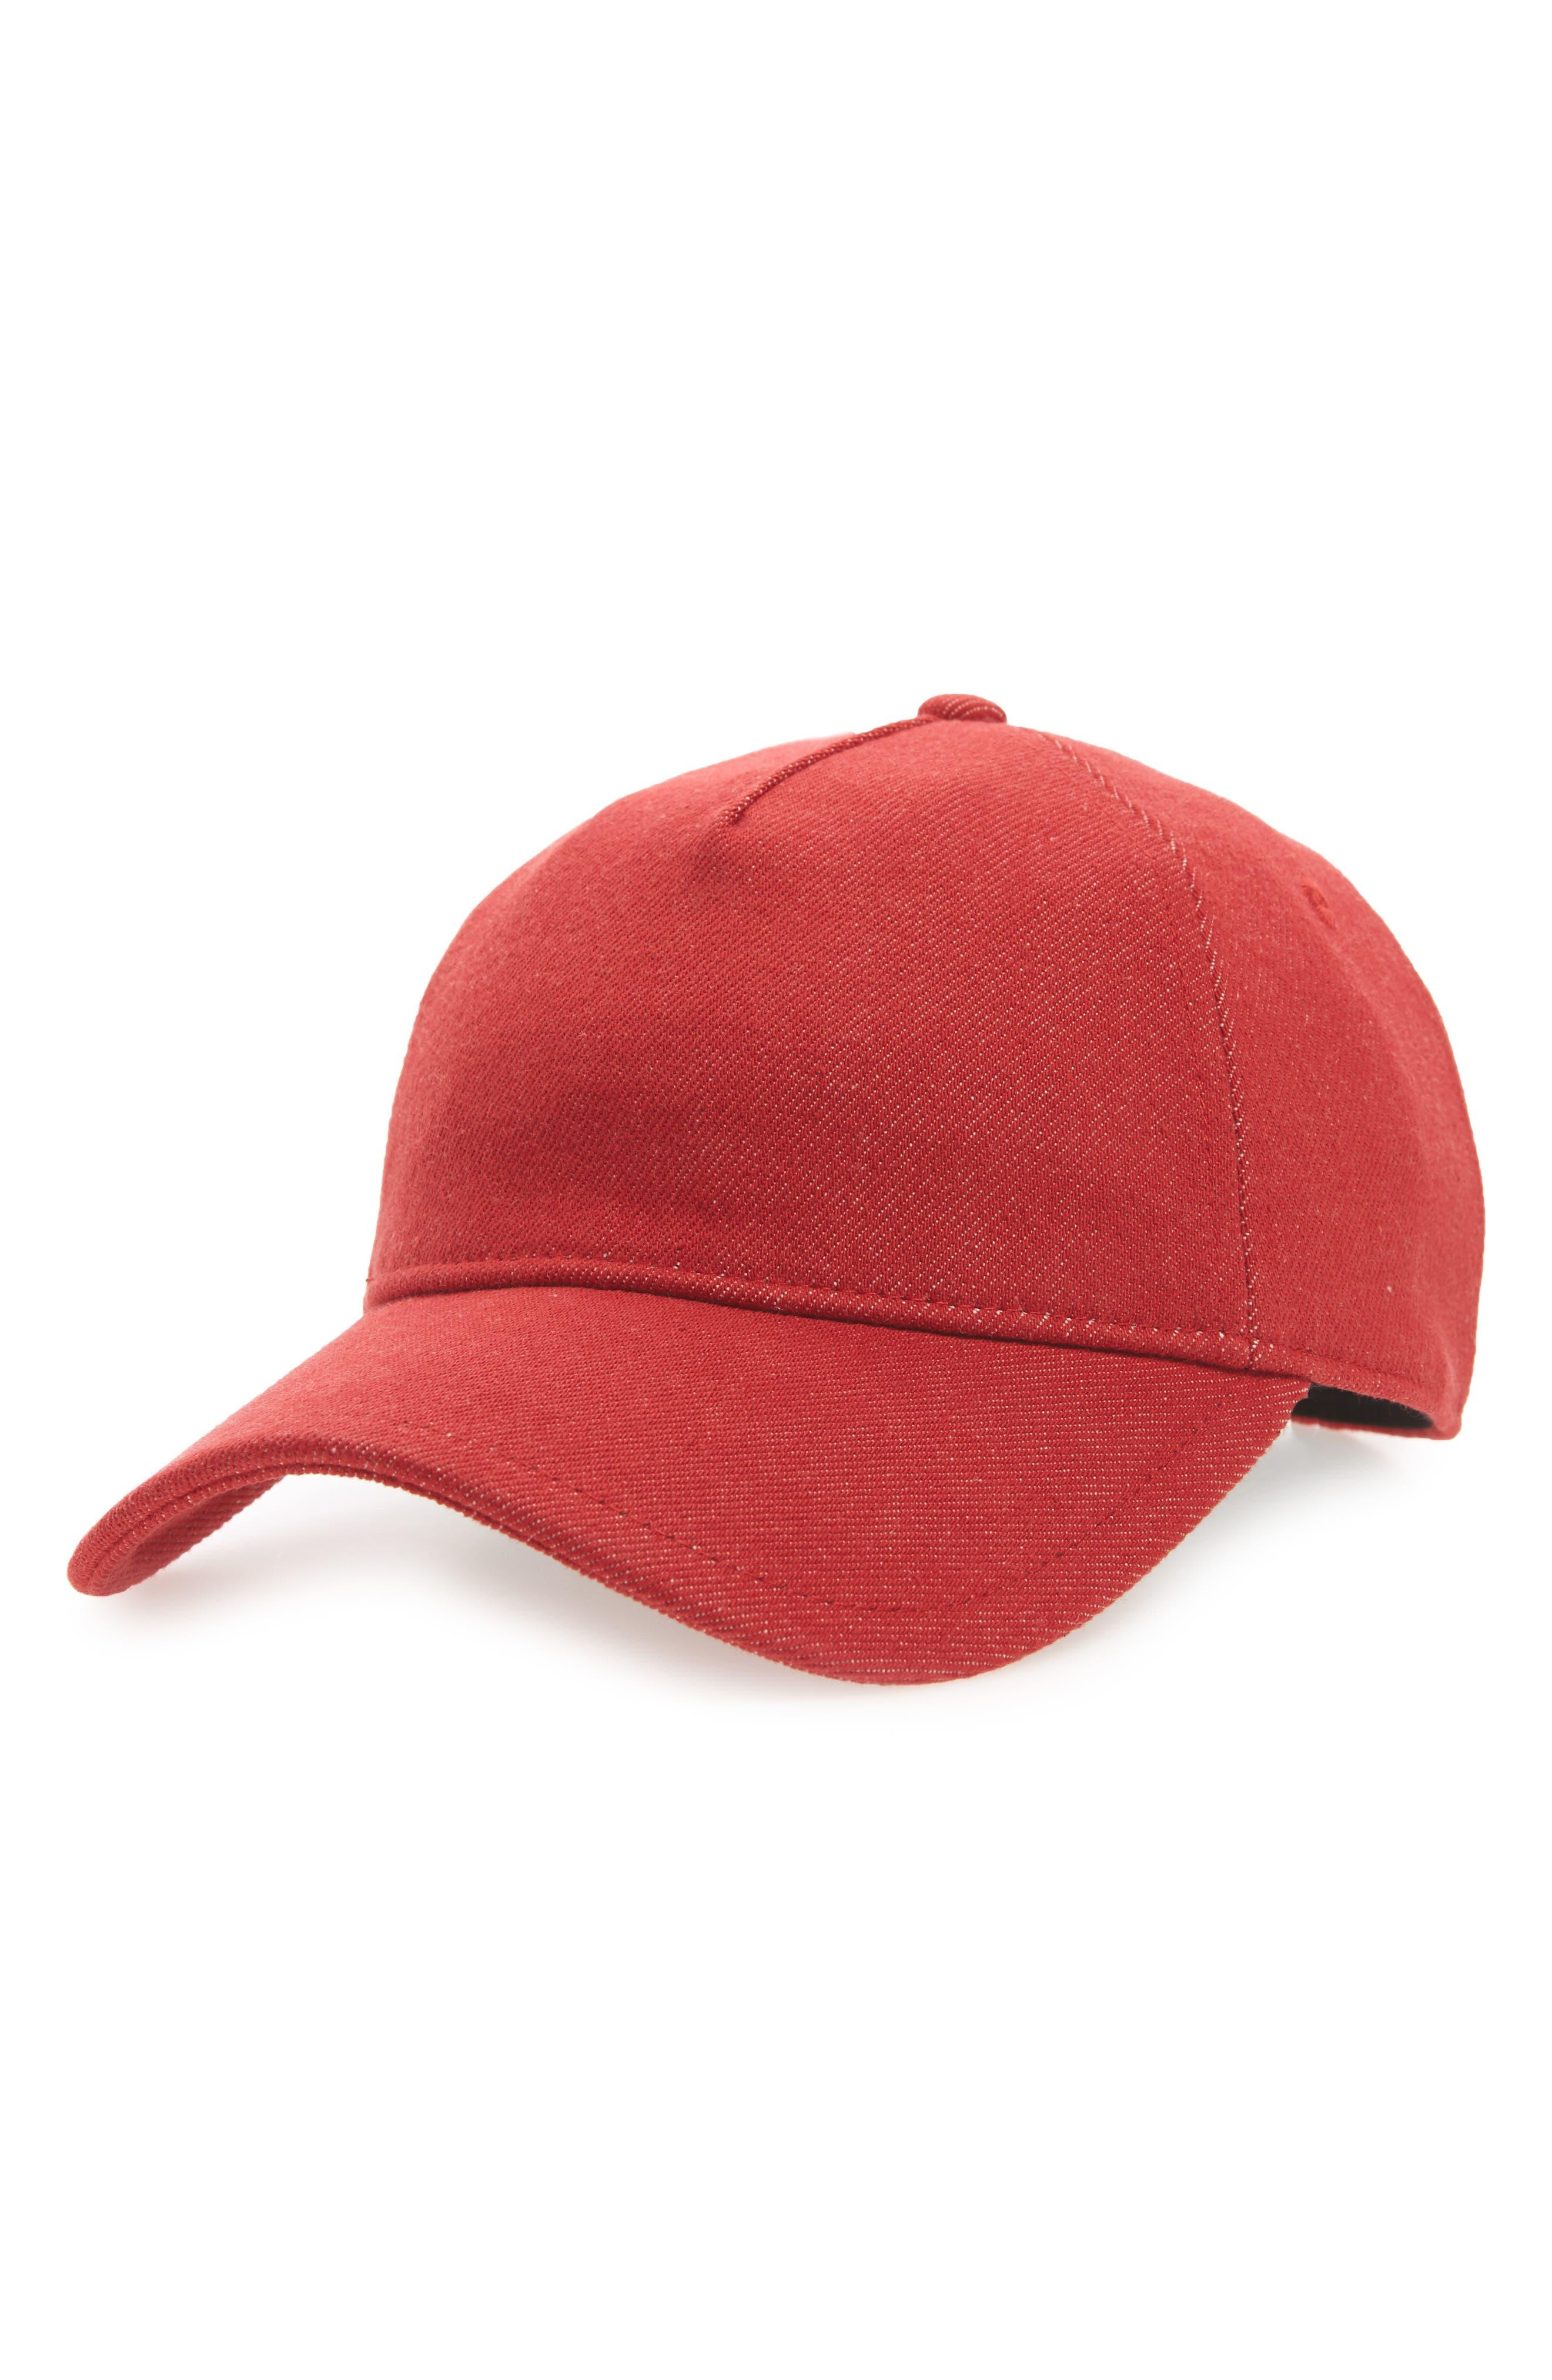 Marilyn Baseball Cap,                         Main,                         color, Red